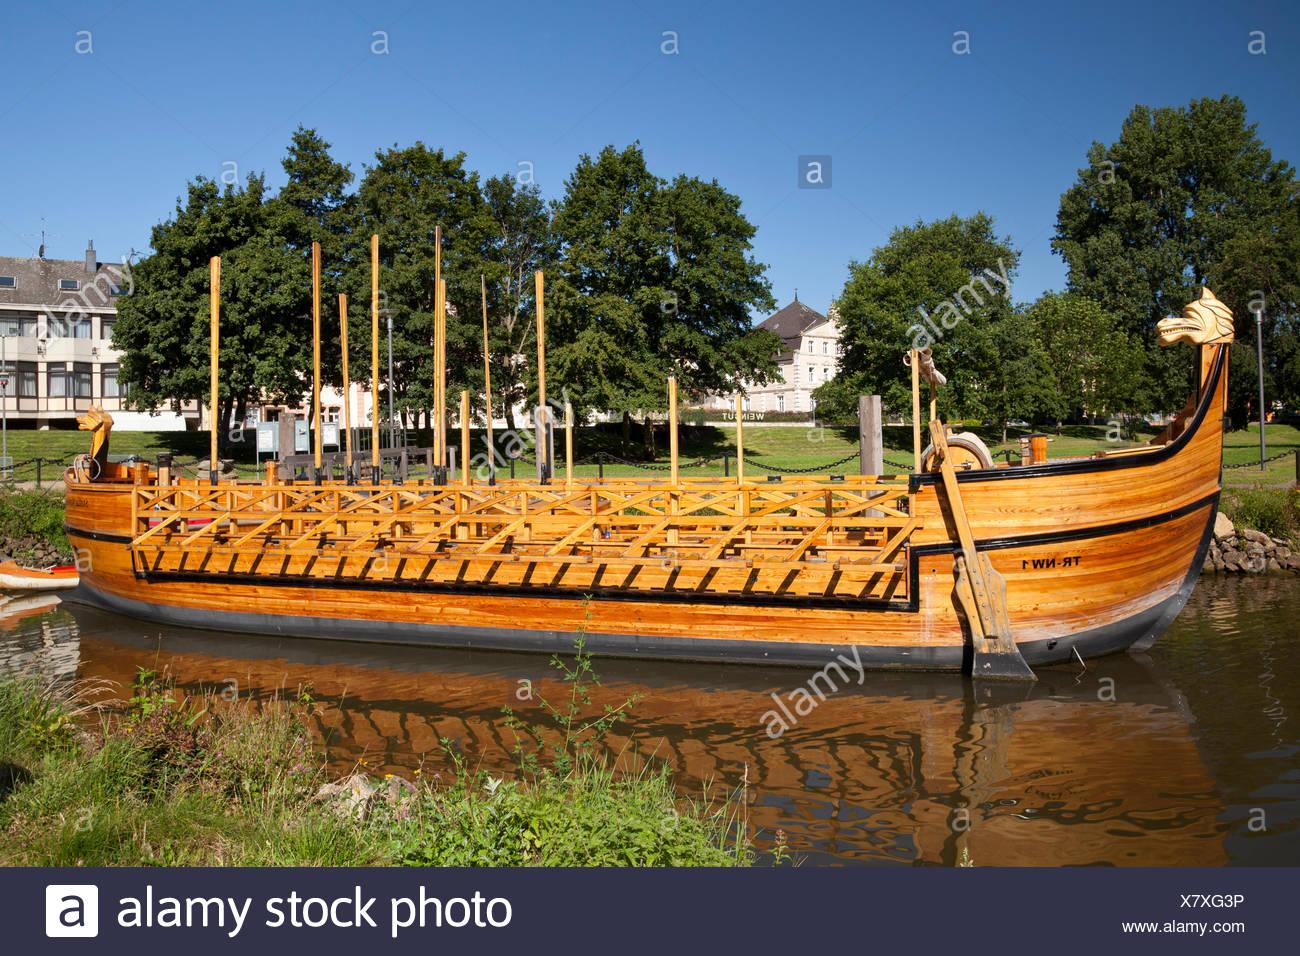 replica-of-a-roman-wine-boat-stella-noviomagi-or-star-of-neumagen-neumagen-dhron-moselle-rhineland-palatinate-publicground-X7XG3P.jpg